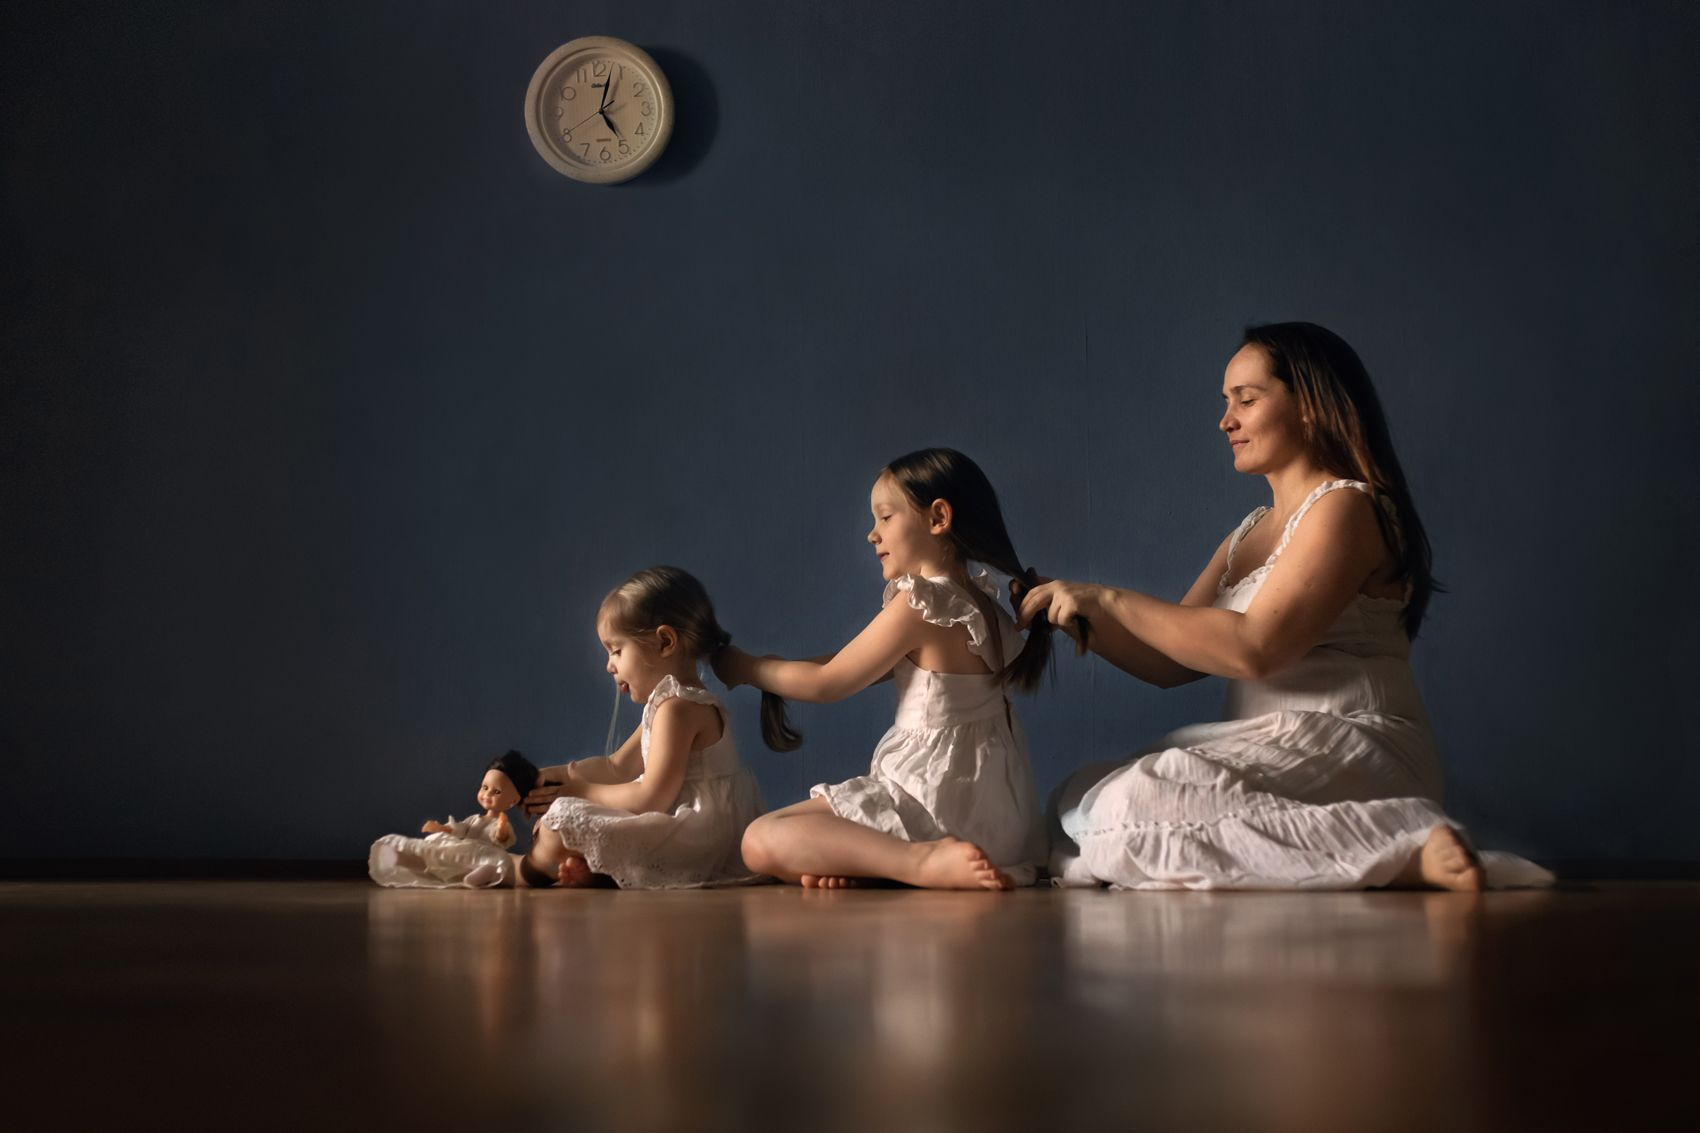 девочки, такие девочки ) семья дочки девочки время кукла коса